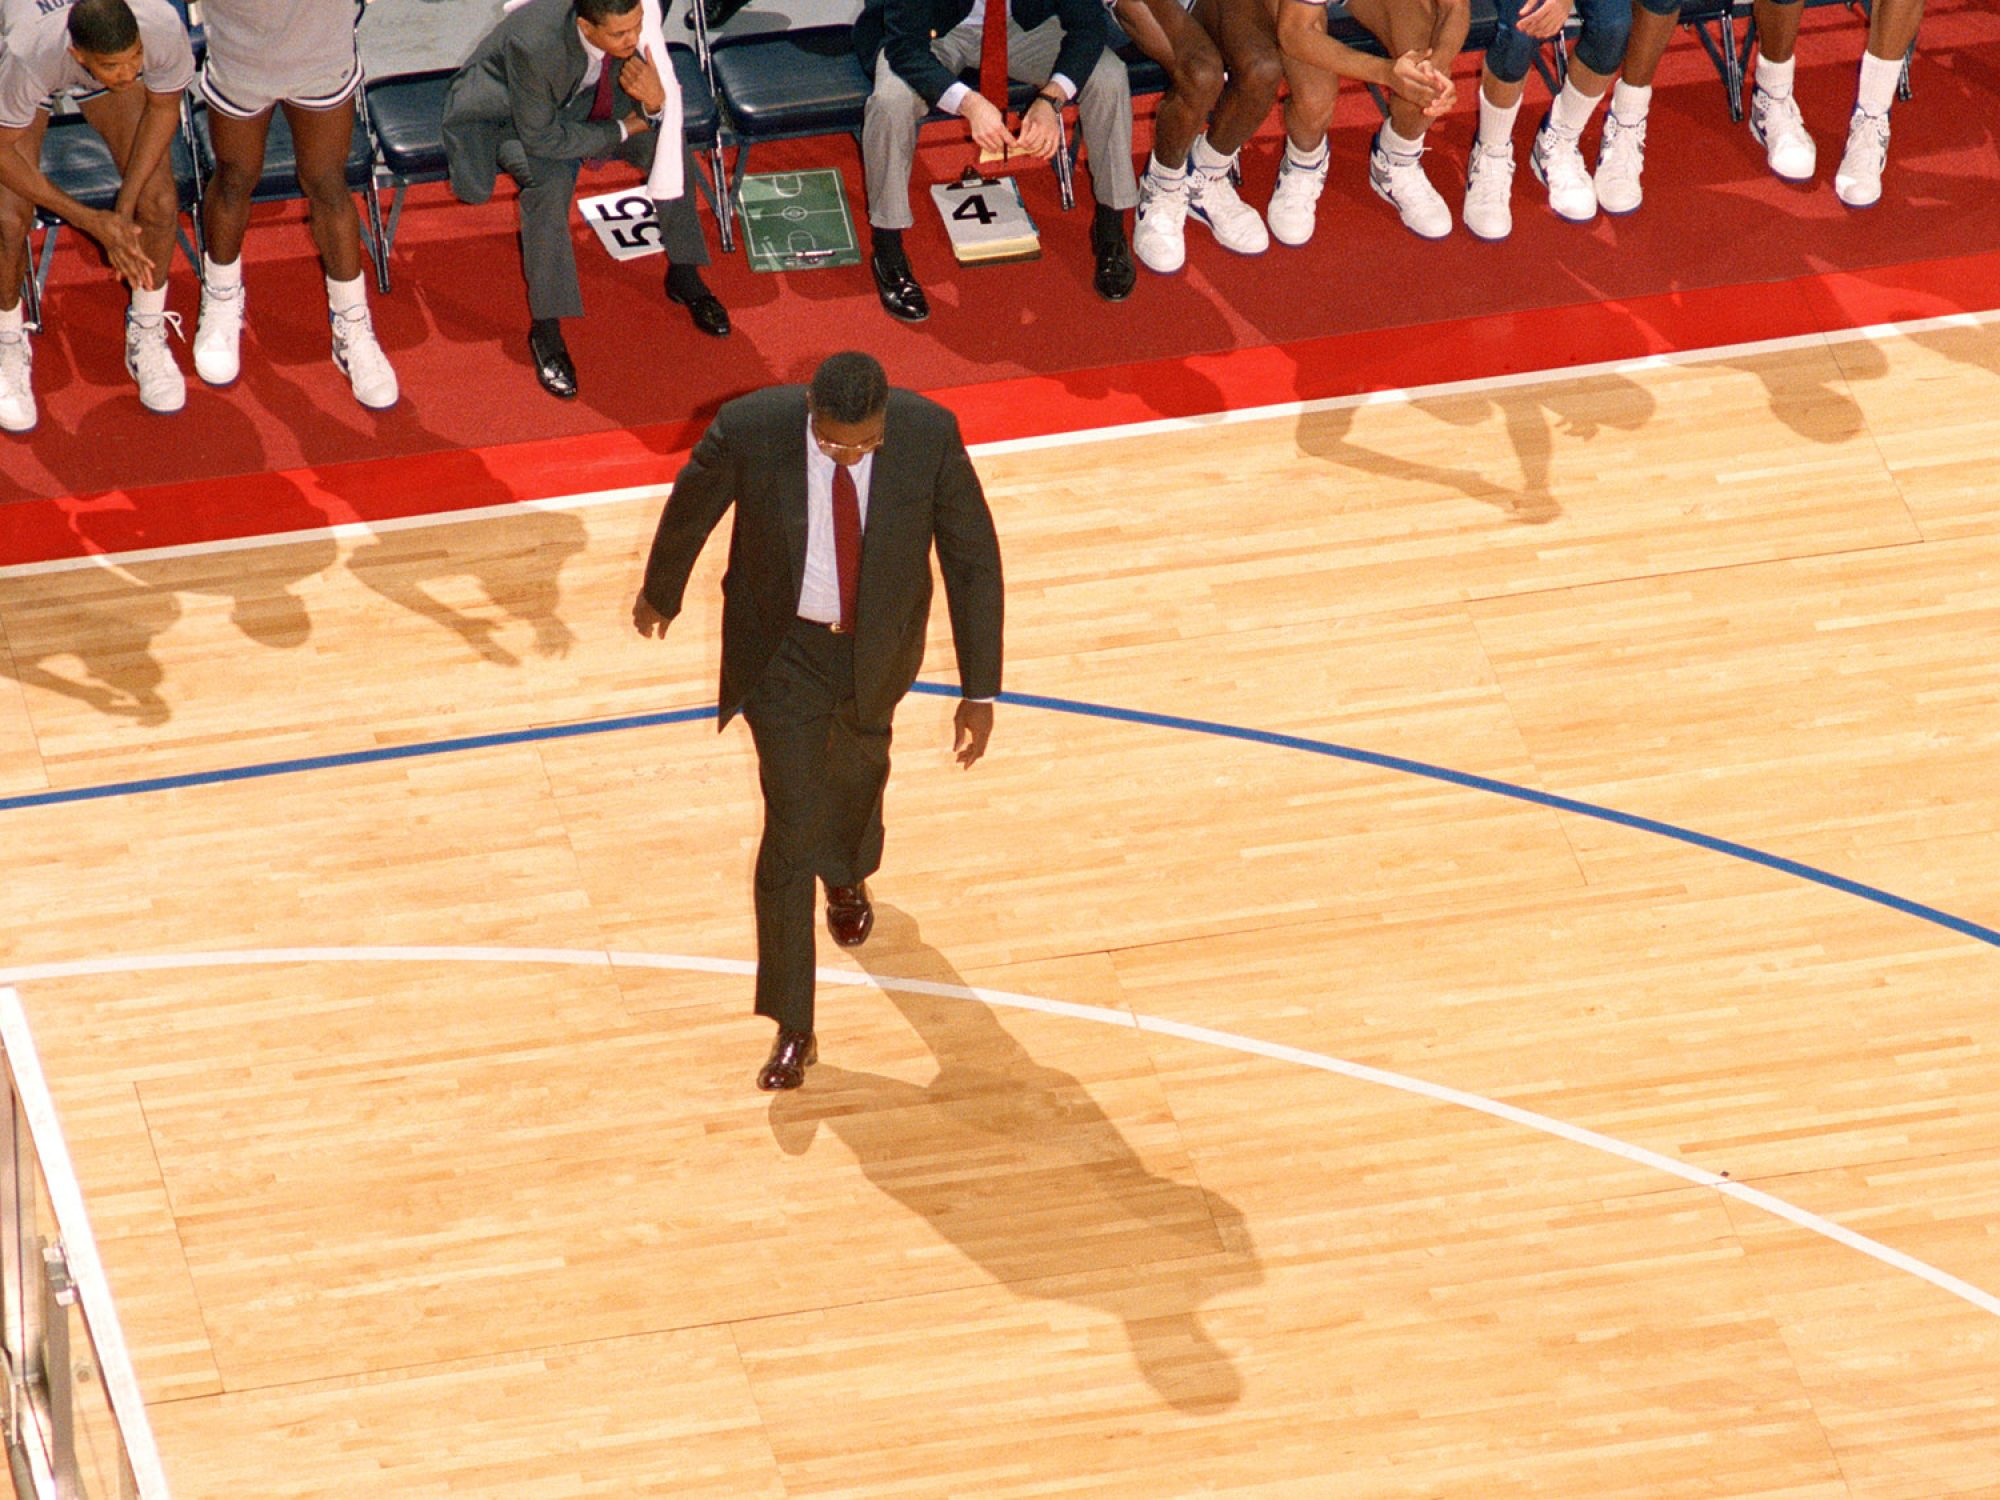 An aerial view of John Thompson Jr. walking across the basketball court.